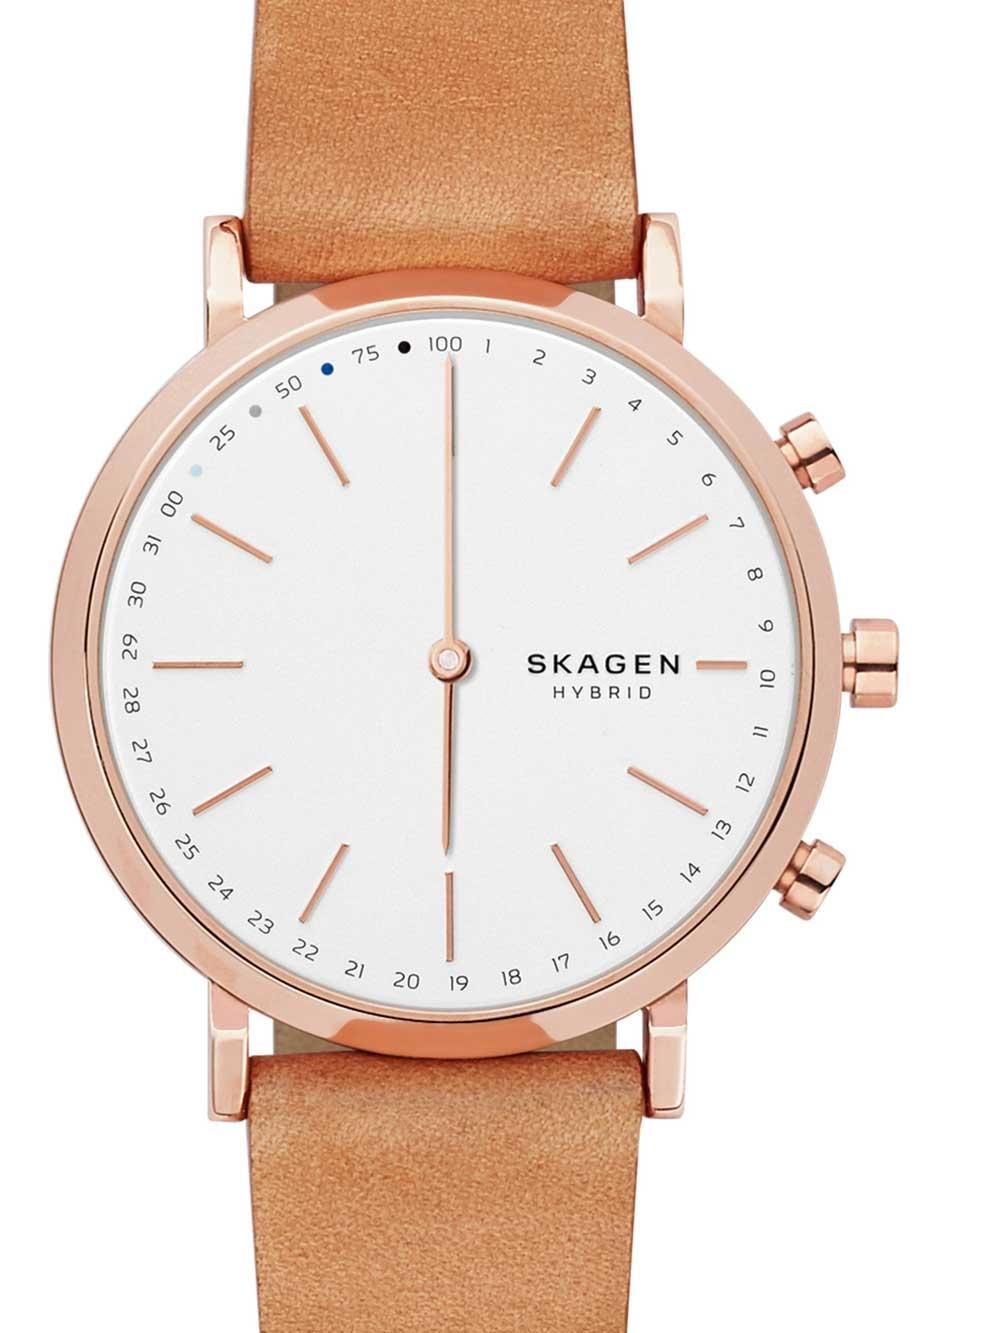 Skagen SKT1204 CA Hald Rosego Hybrid Smartwatch Damen 40mm 3ATM